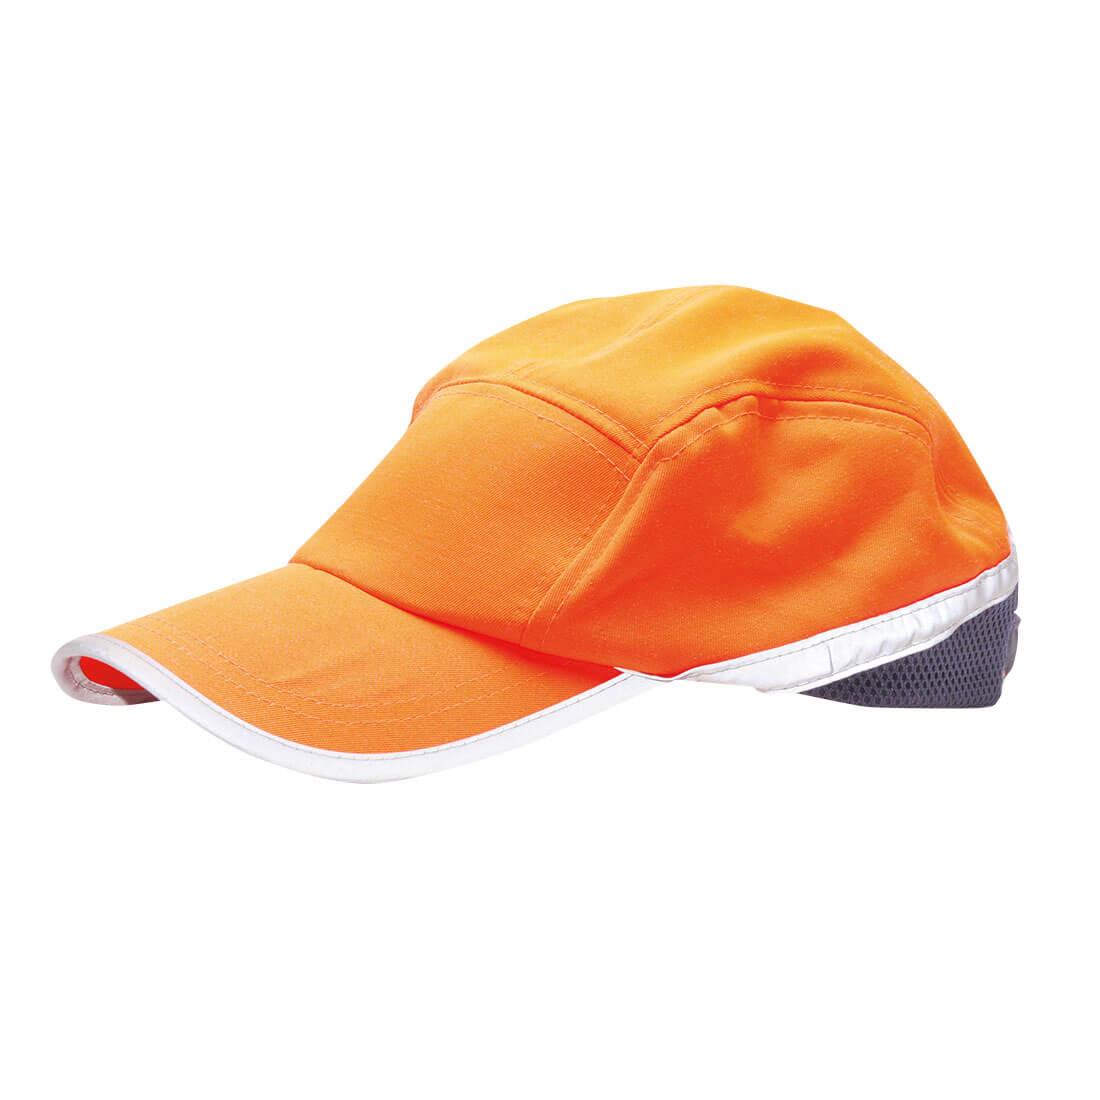 Image of Portwest Hi Vis Baseball Cap Orange / Navy One Size